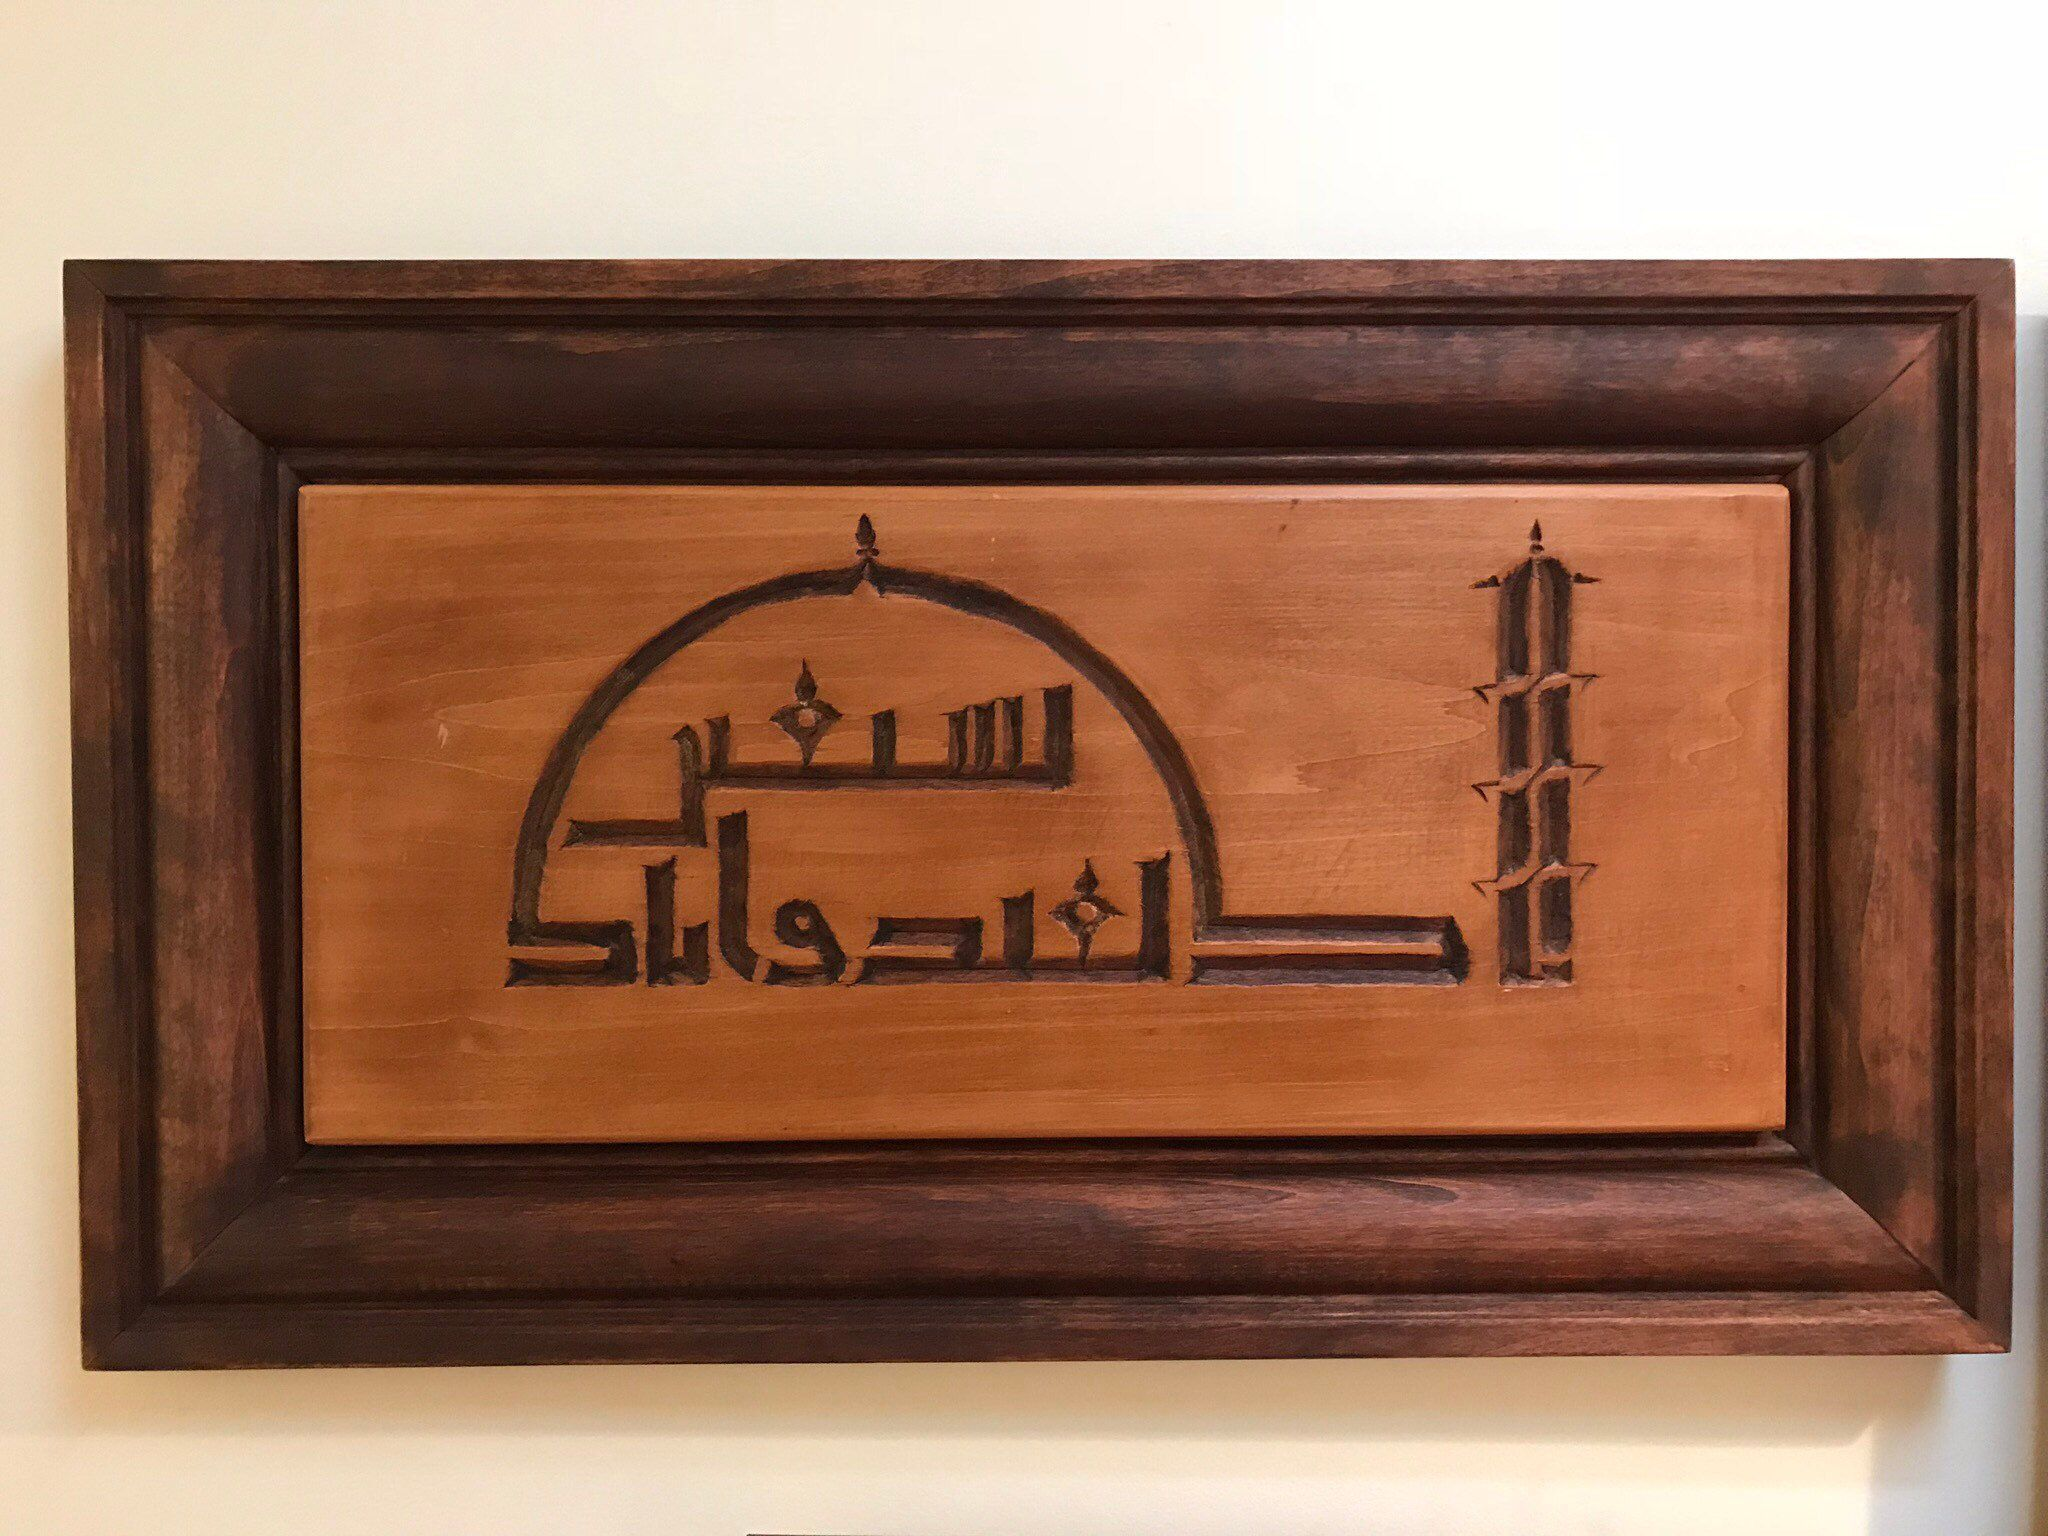 Wood carving wall art persian calligraphy iranian art kufic